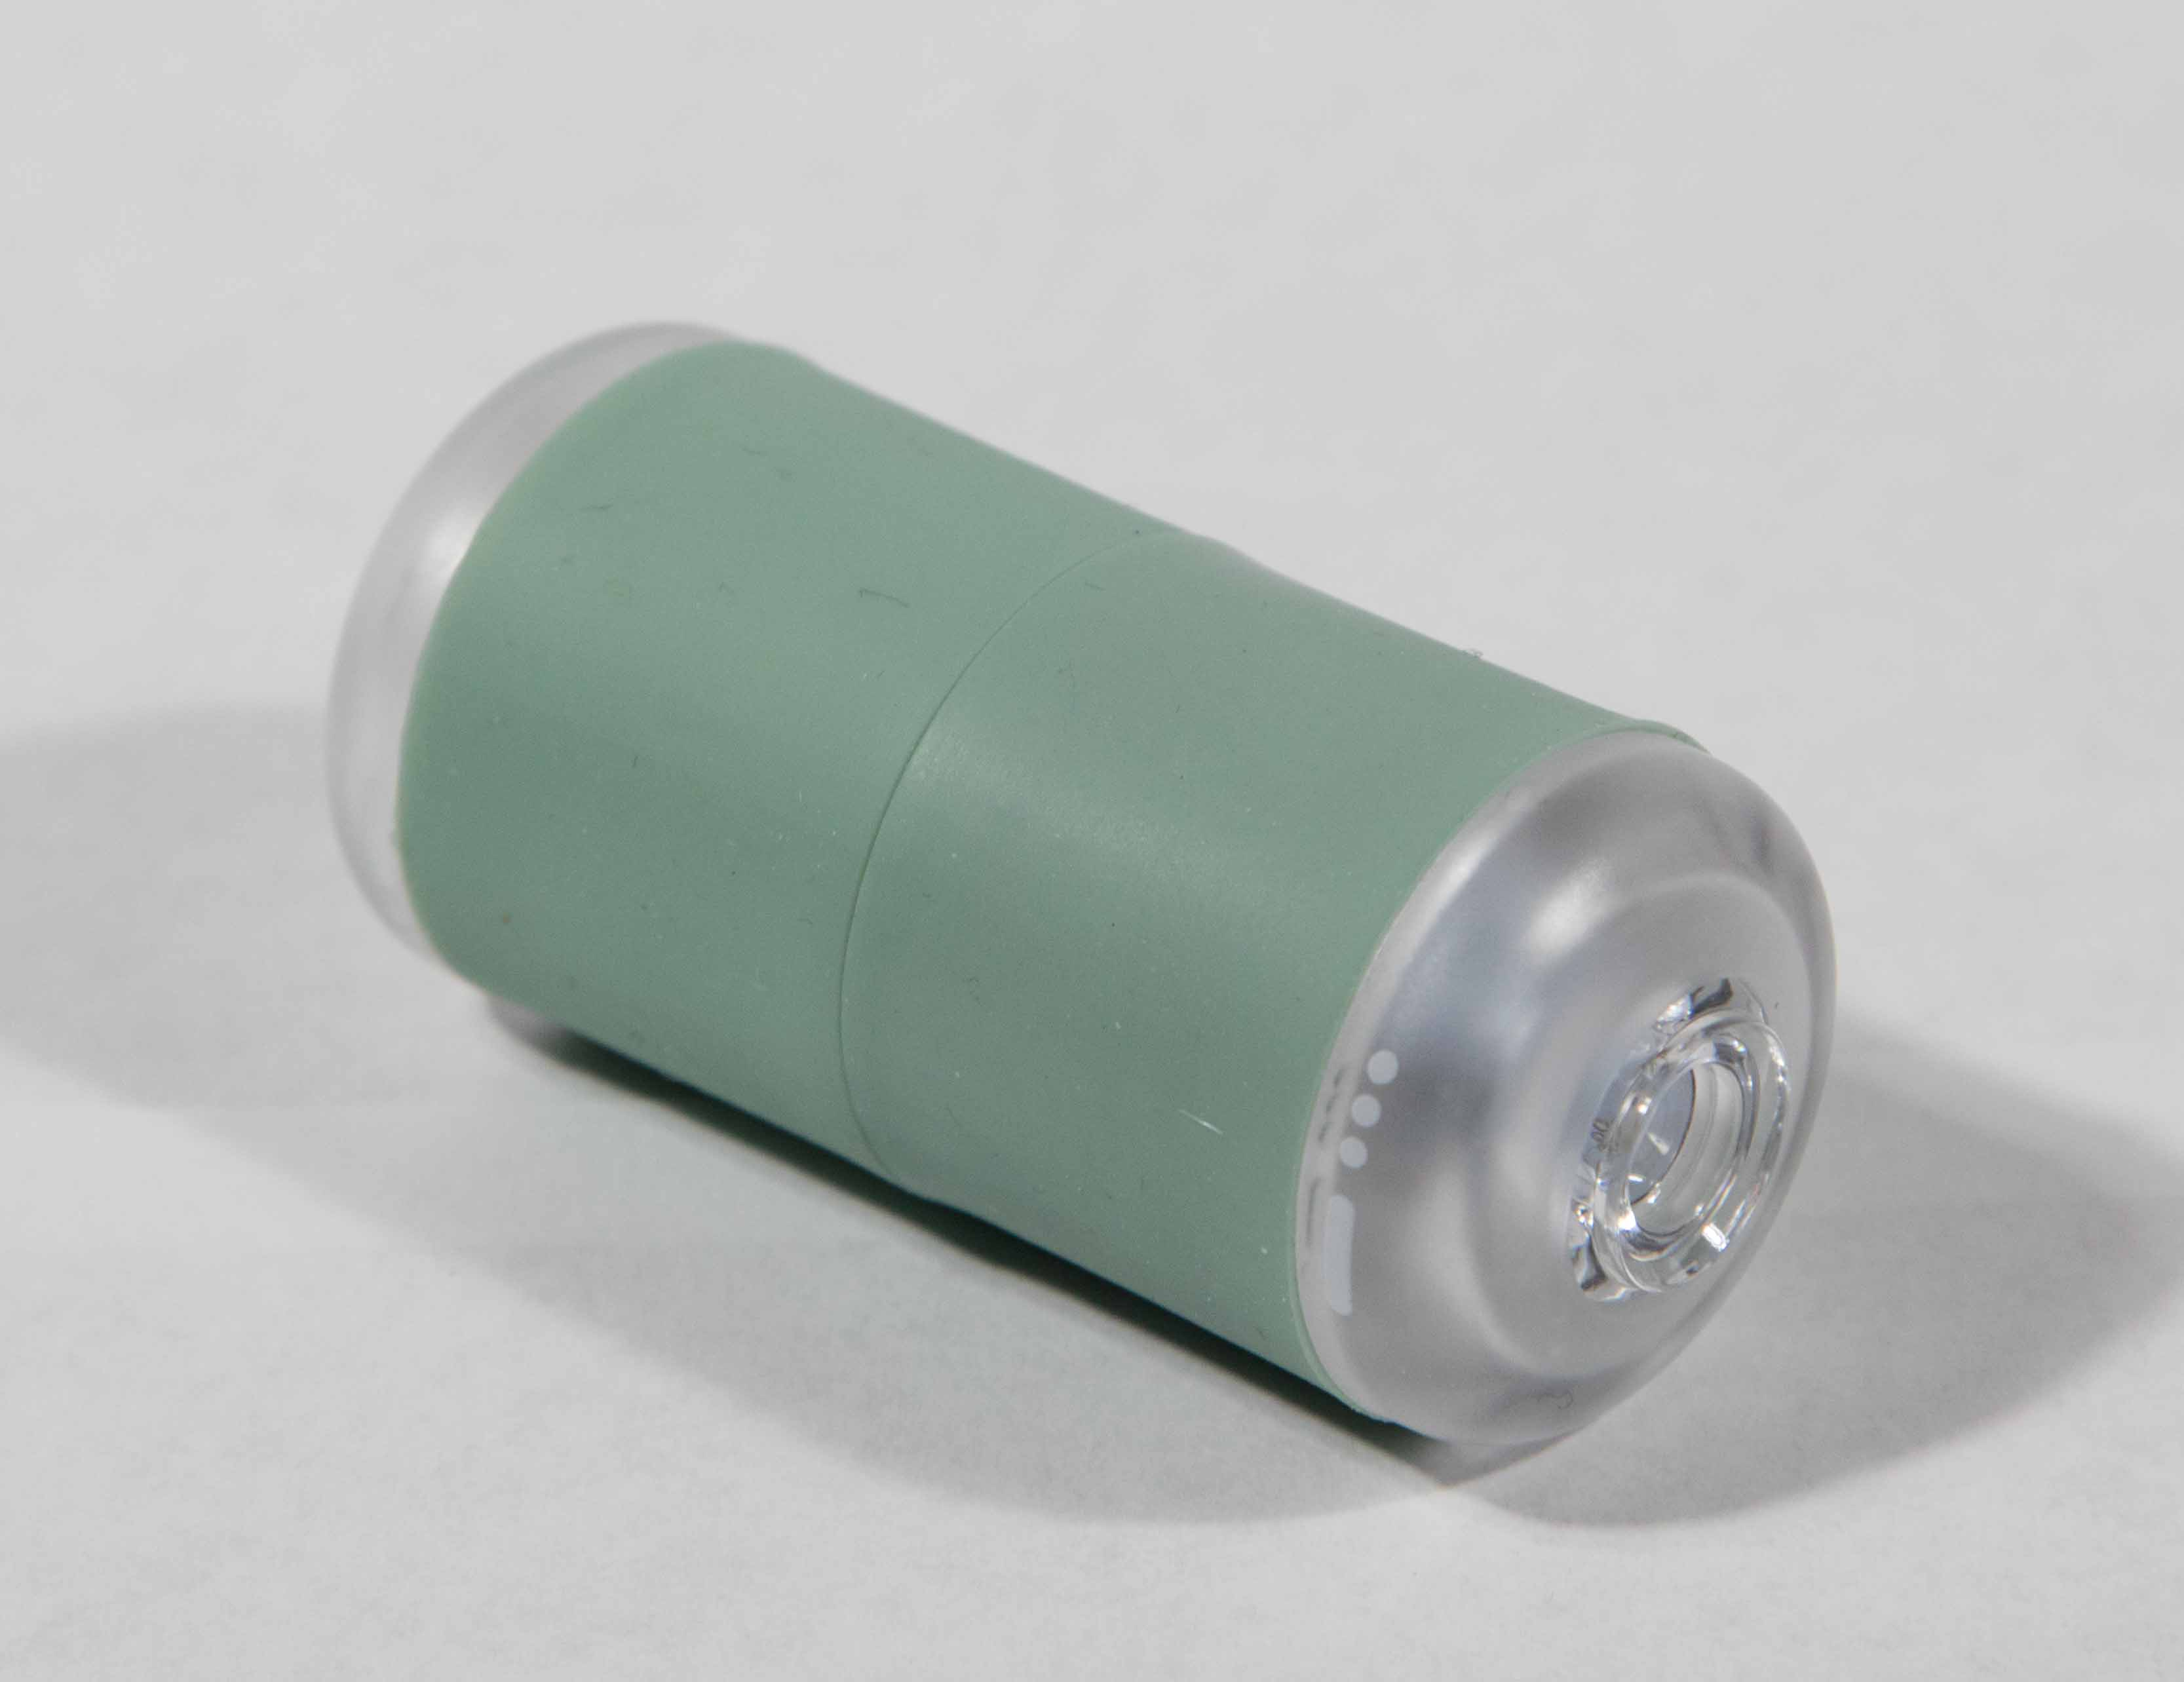 Iflash magnetlygter – Cykelhjelm med led lys